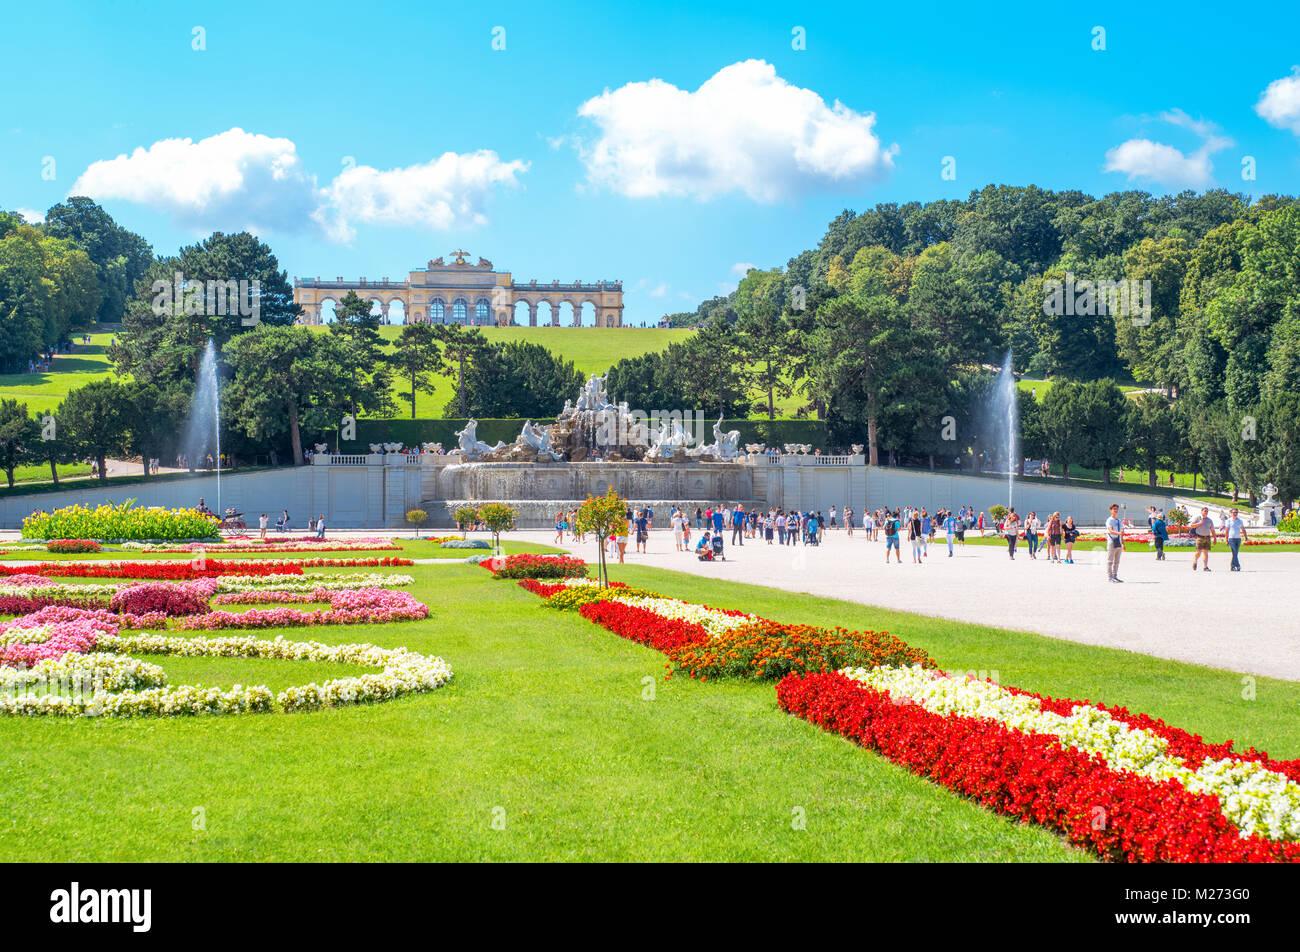 Austria, Vienna,  Schonbrunn Palace ,the Gloriette pavilion seen from the garden - Stock Image